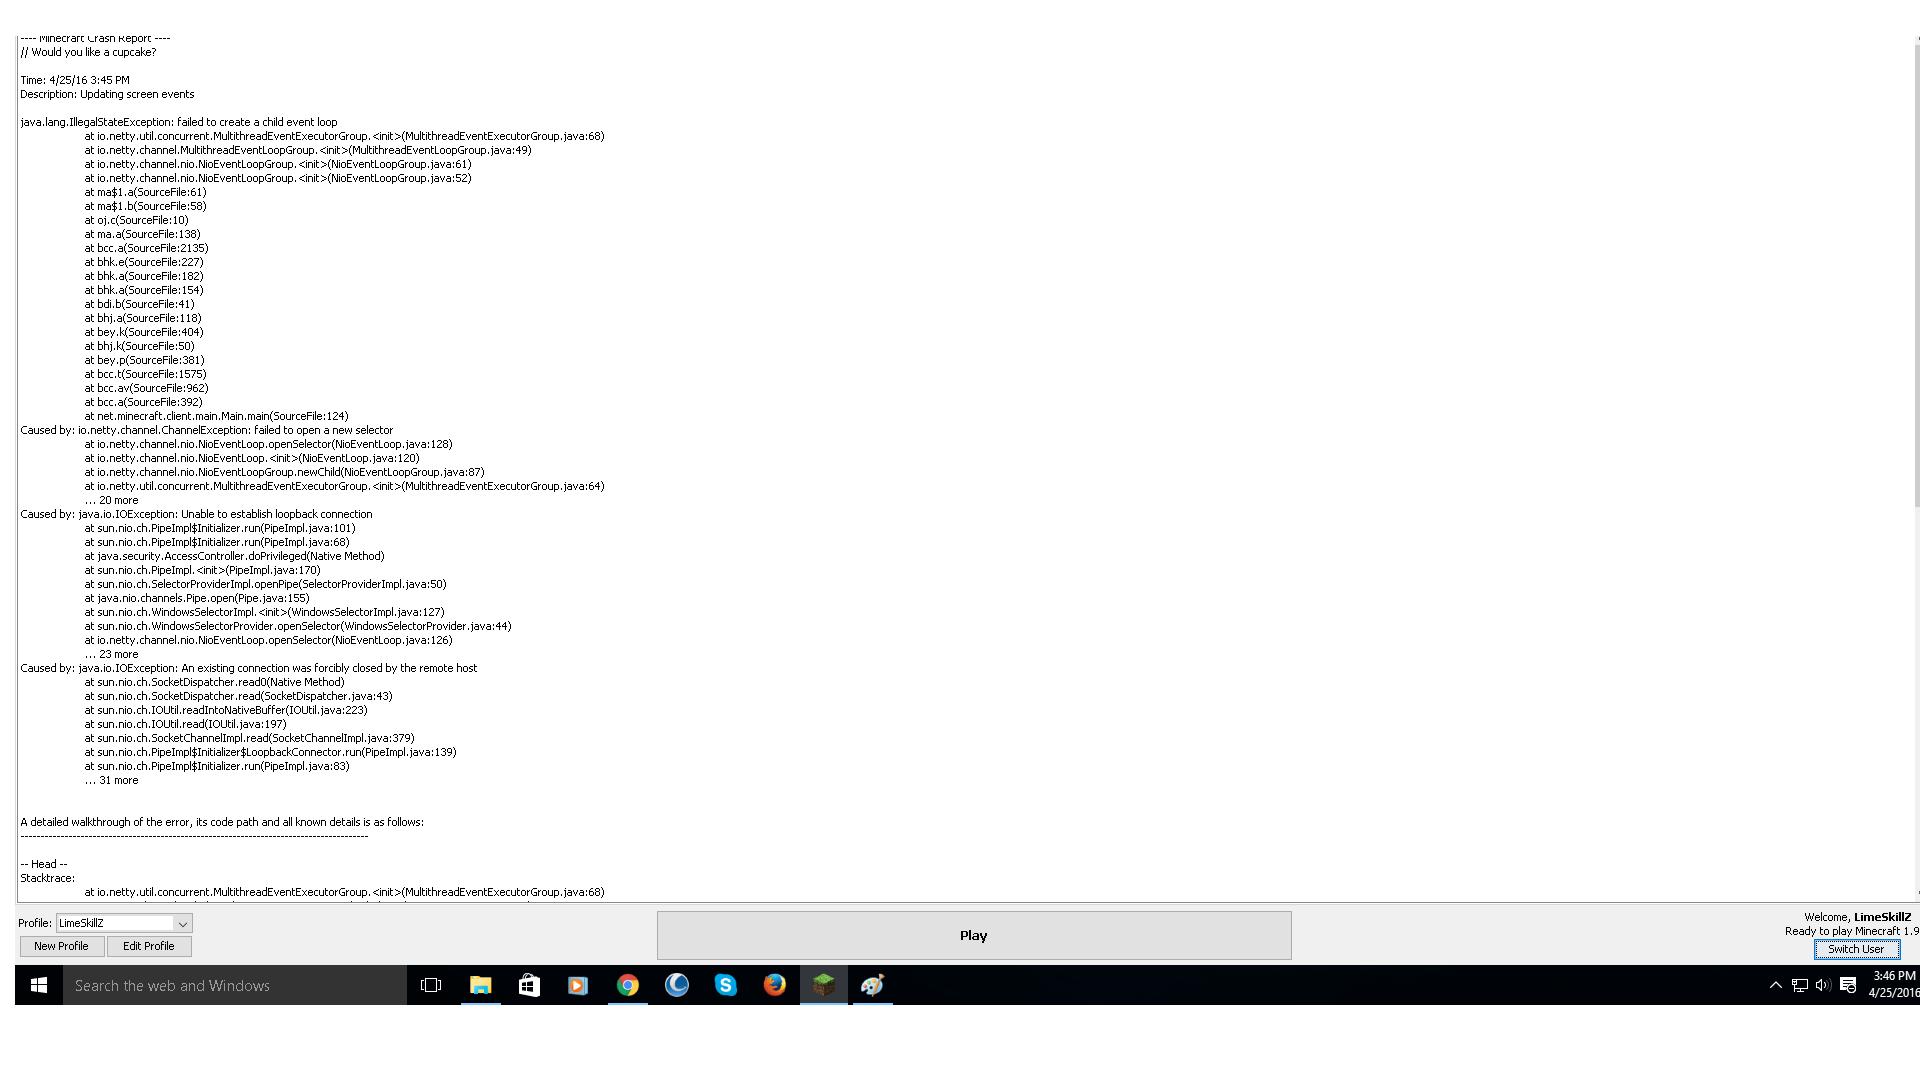 MC-101367] java.lang.nullpointerexception: group - Jira